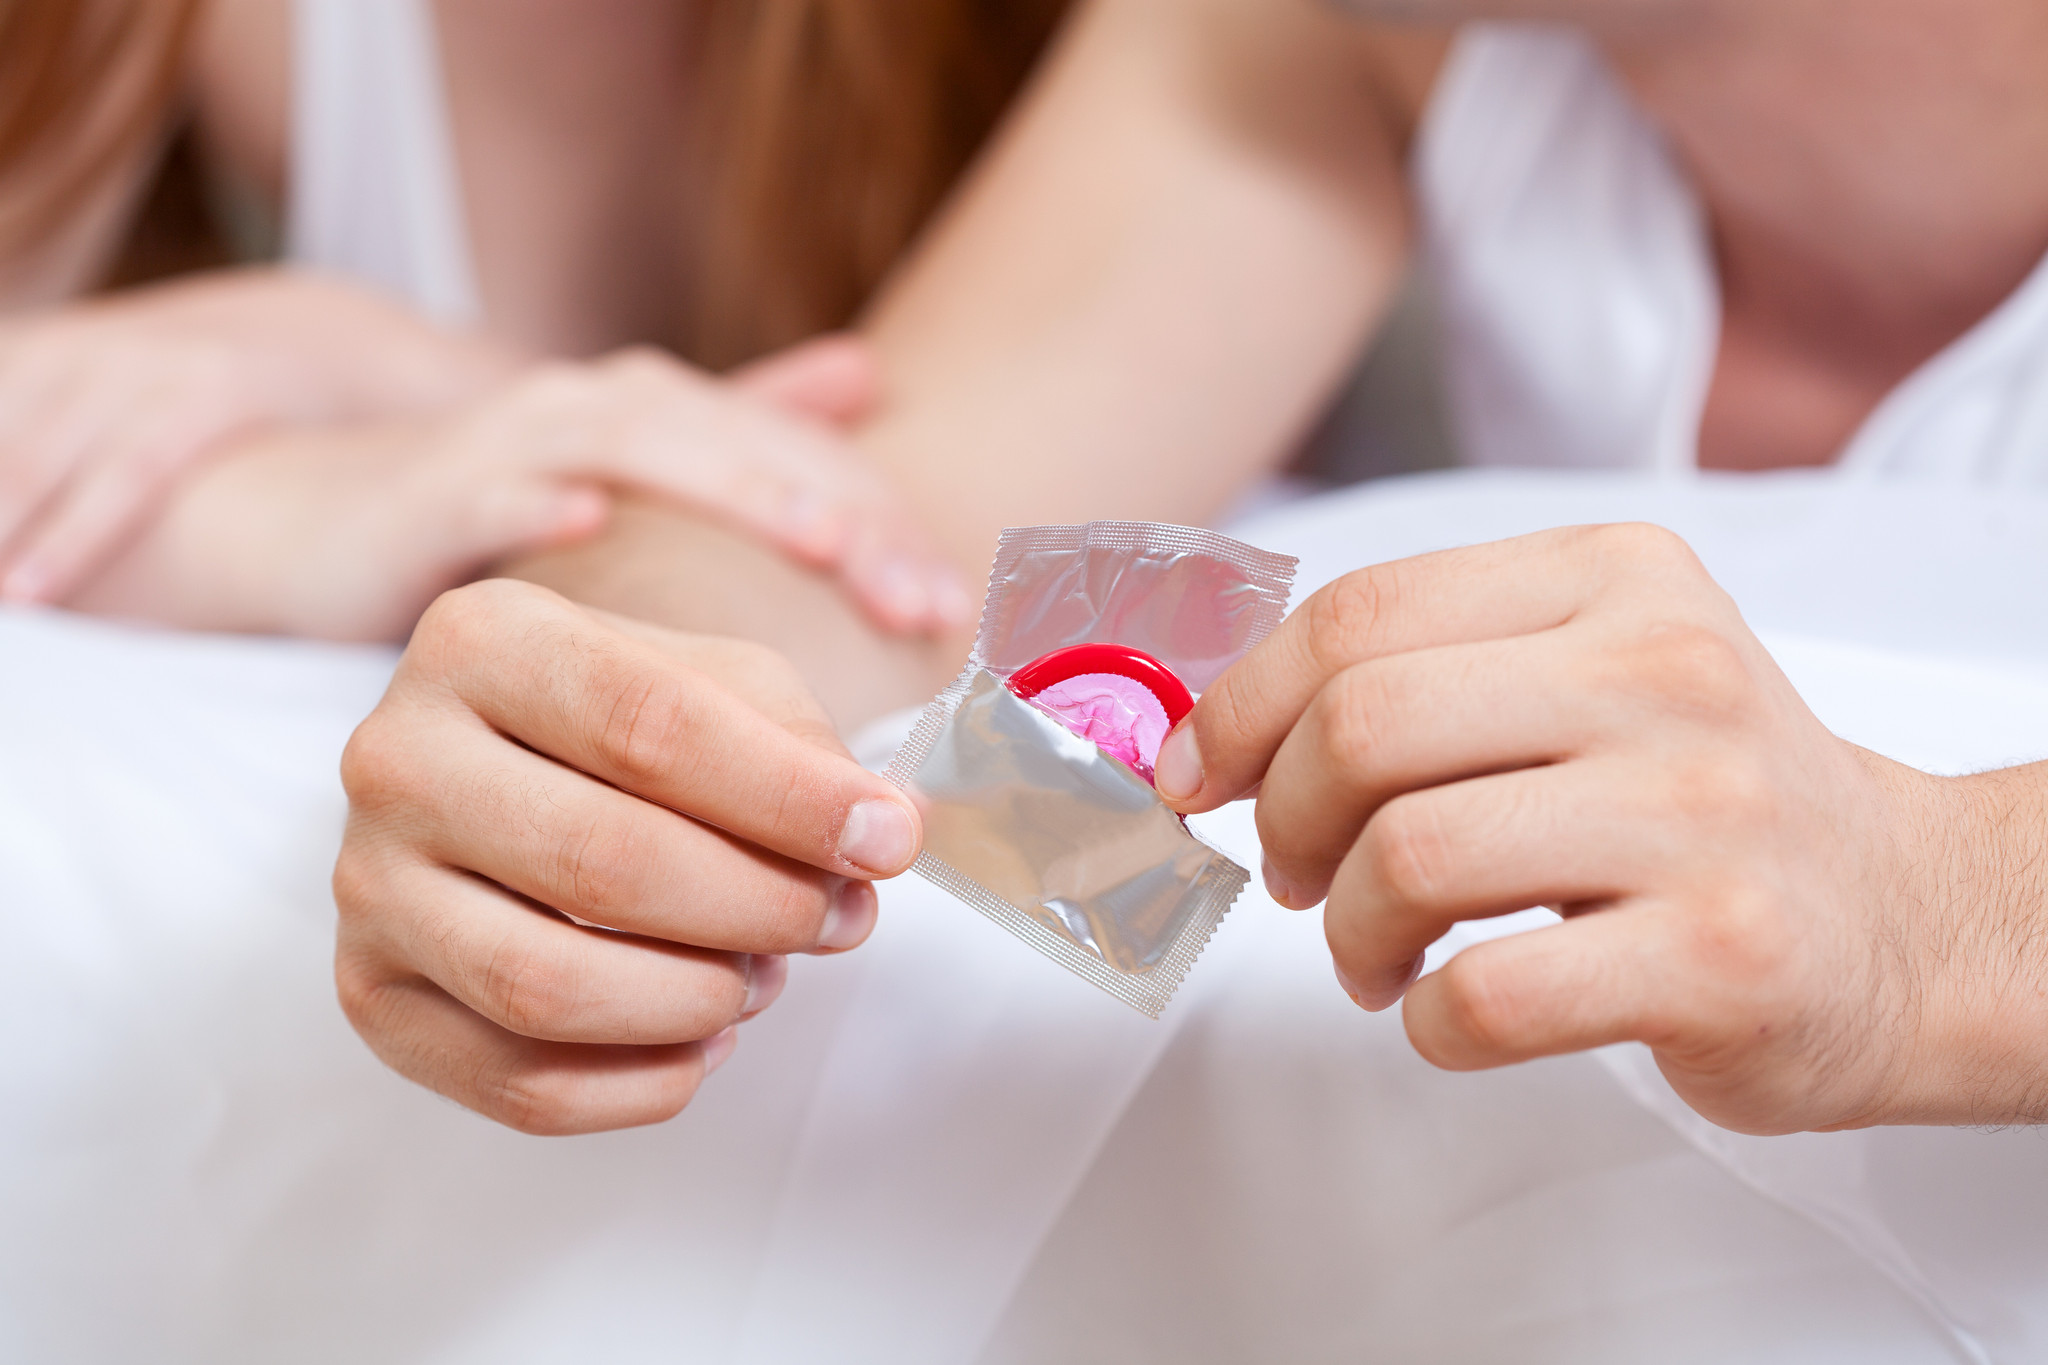 sex condom couple sexo preservativo casal.jpg